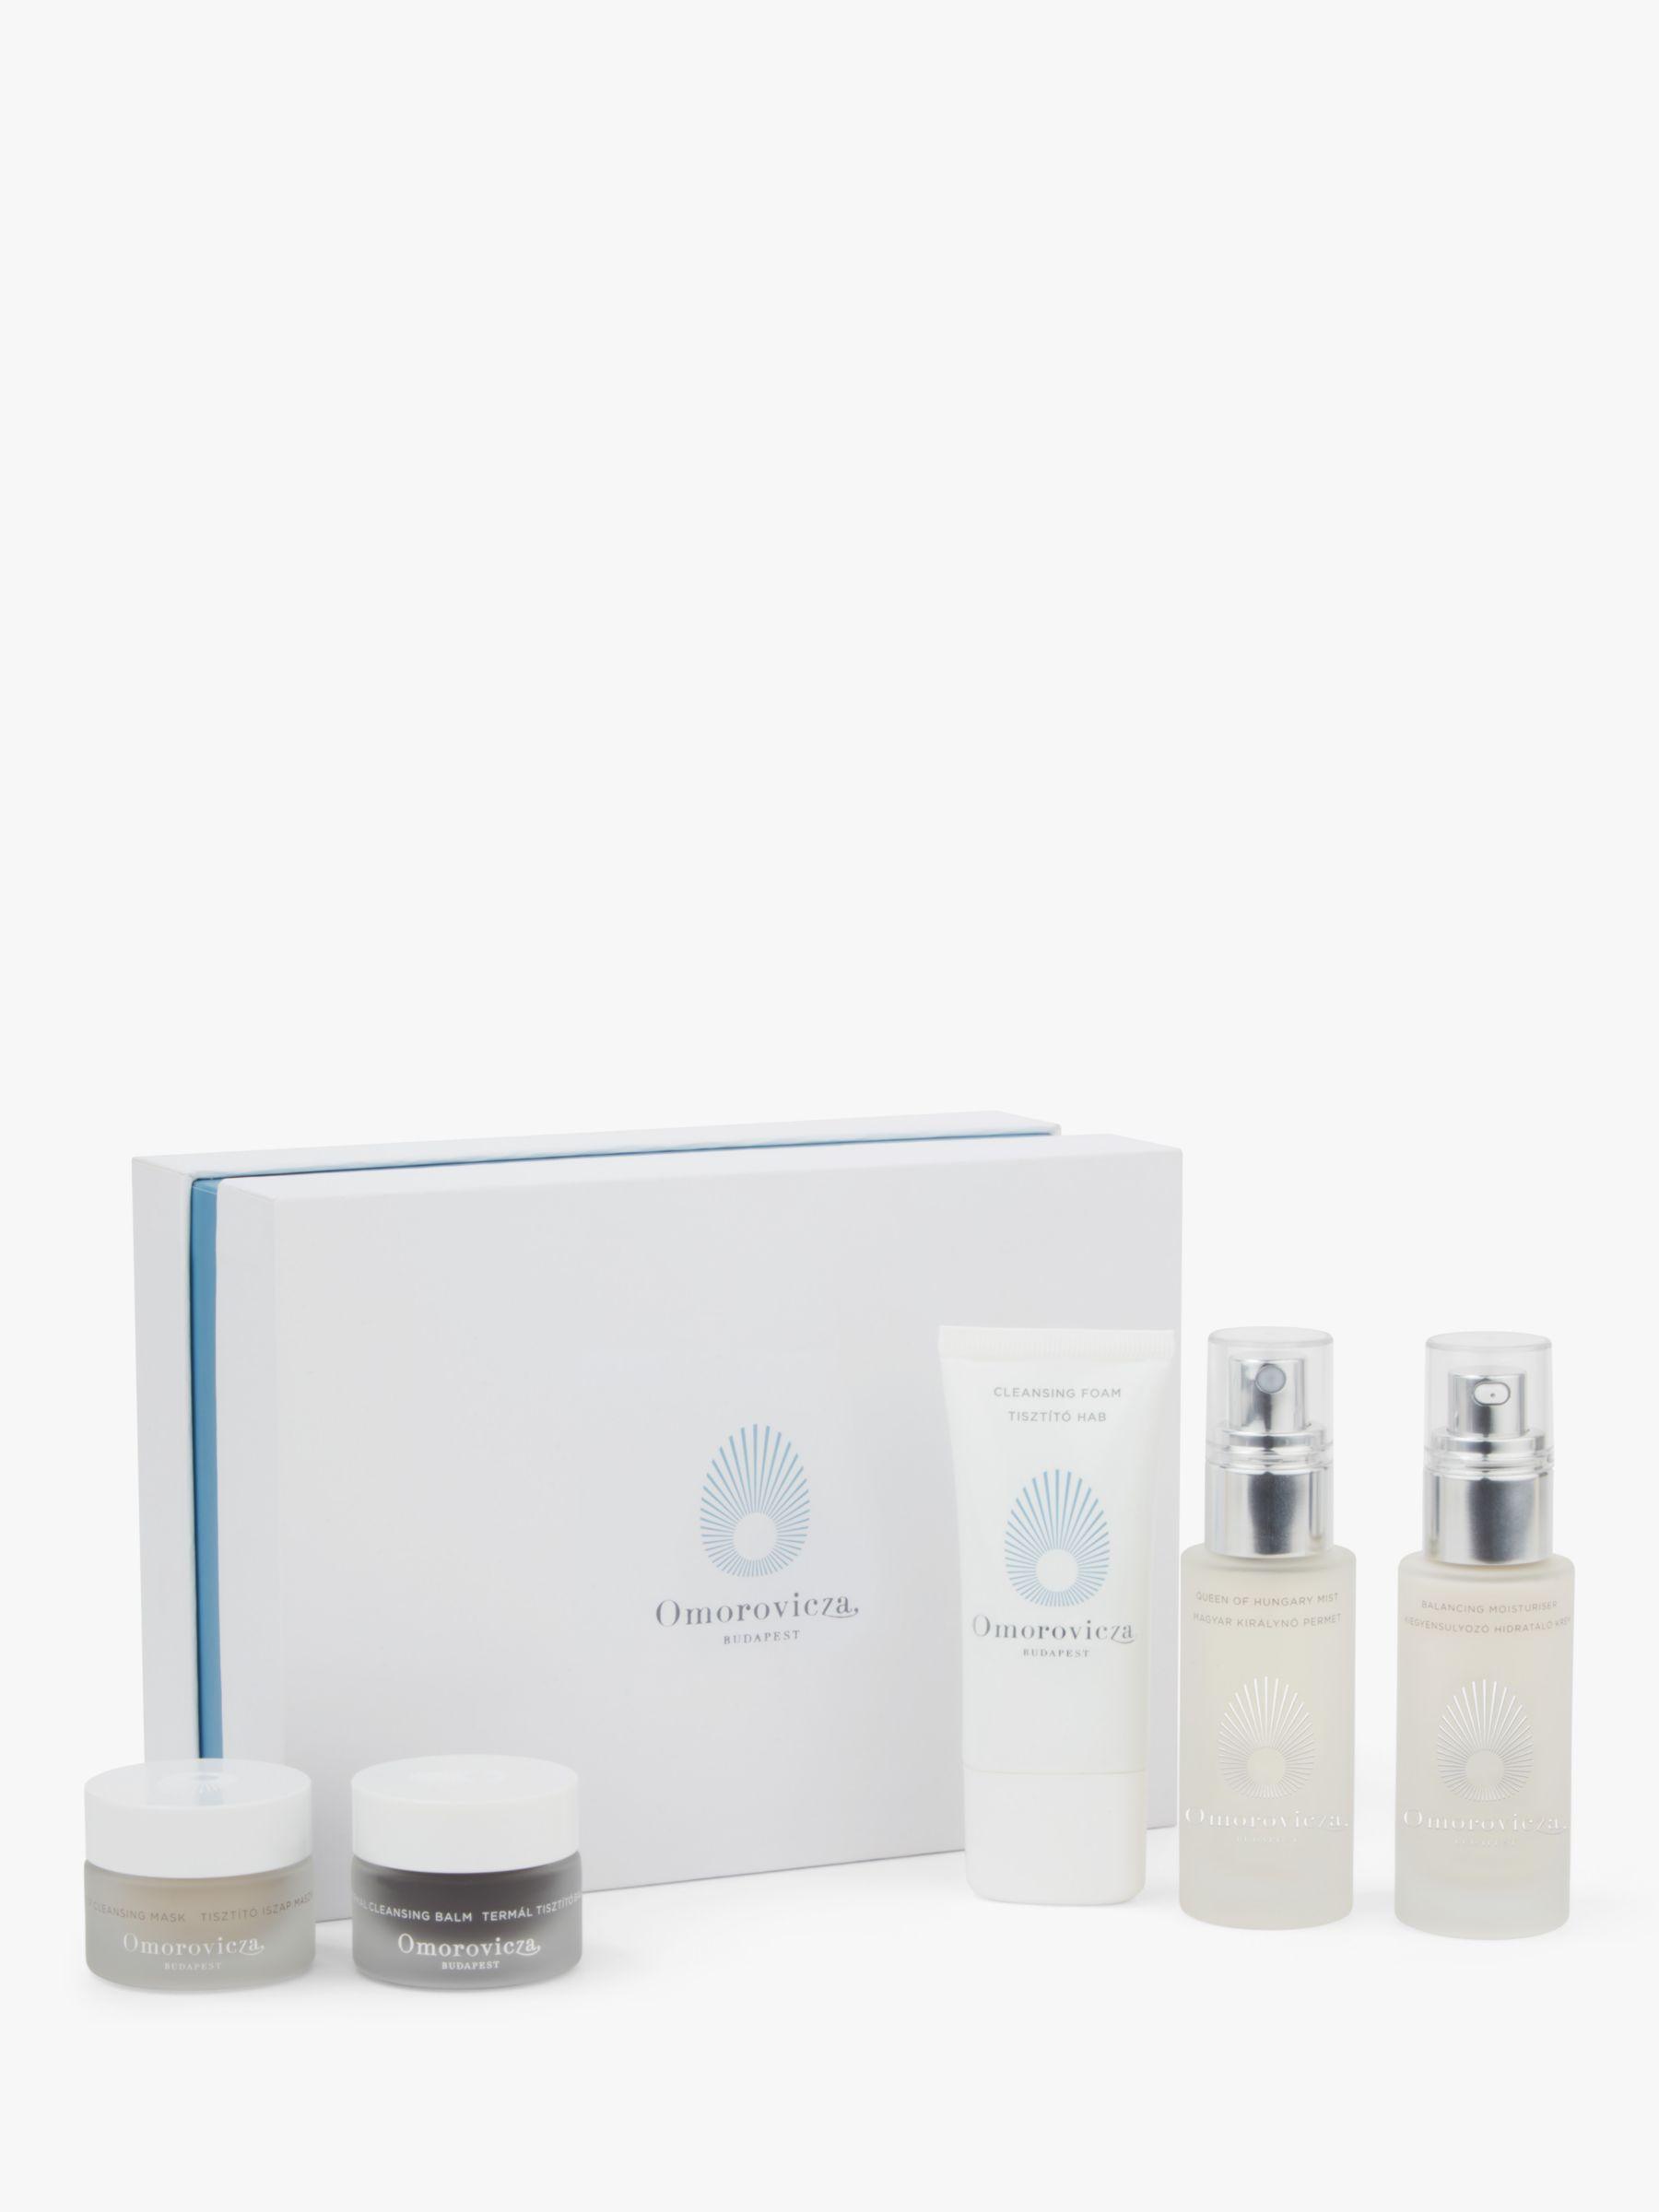 Omorovicza Omorovicza Discovery Skincare Gift Set